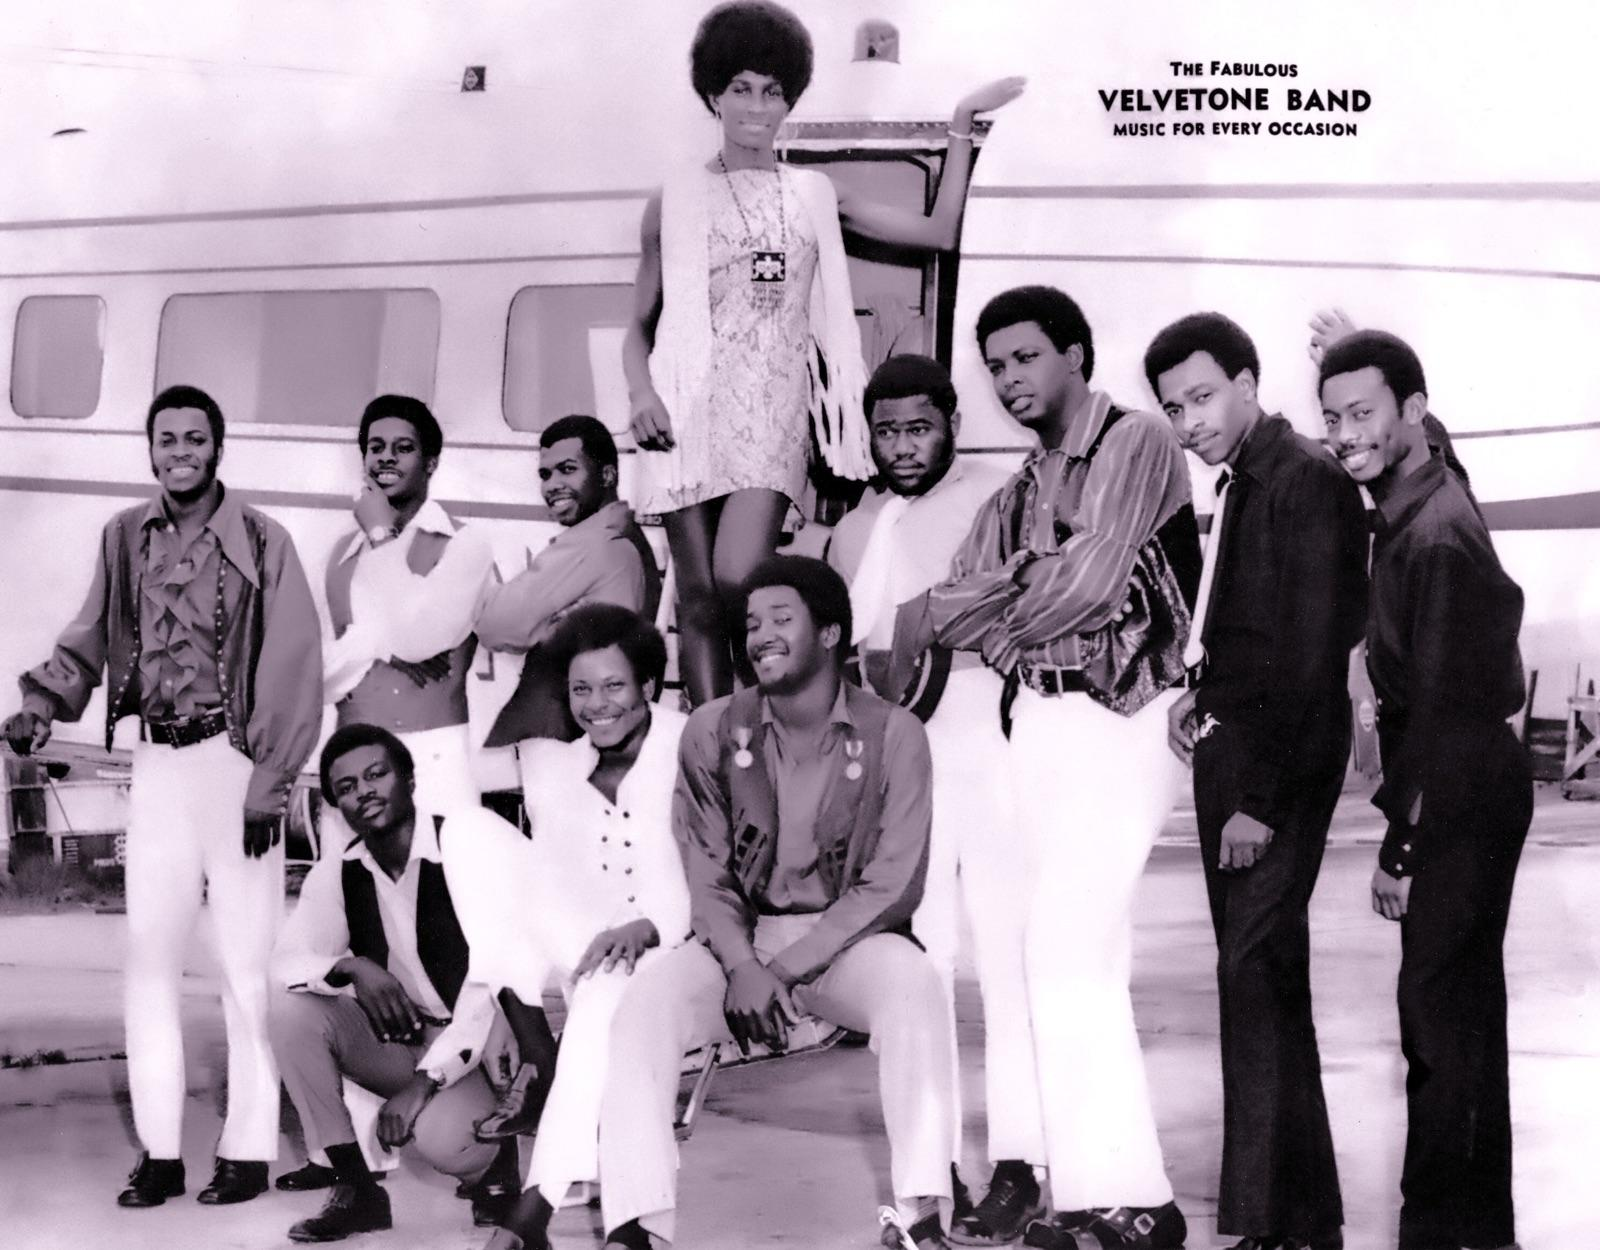 Velvetone Band